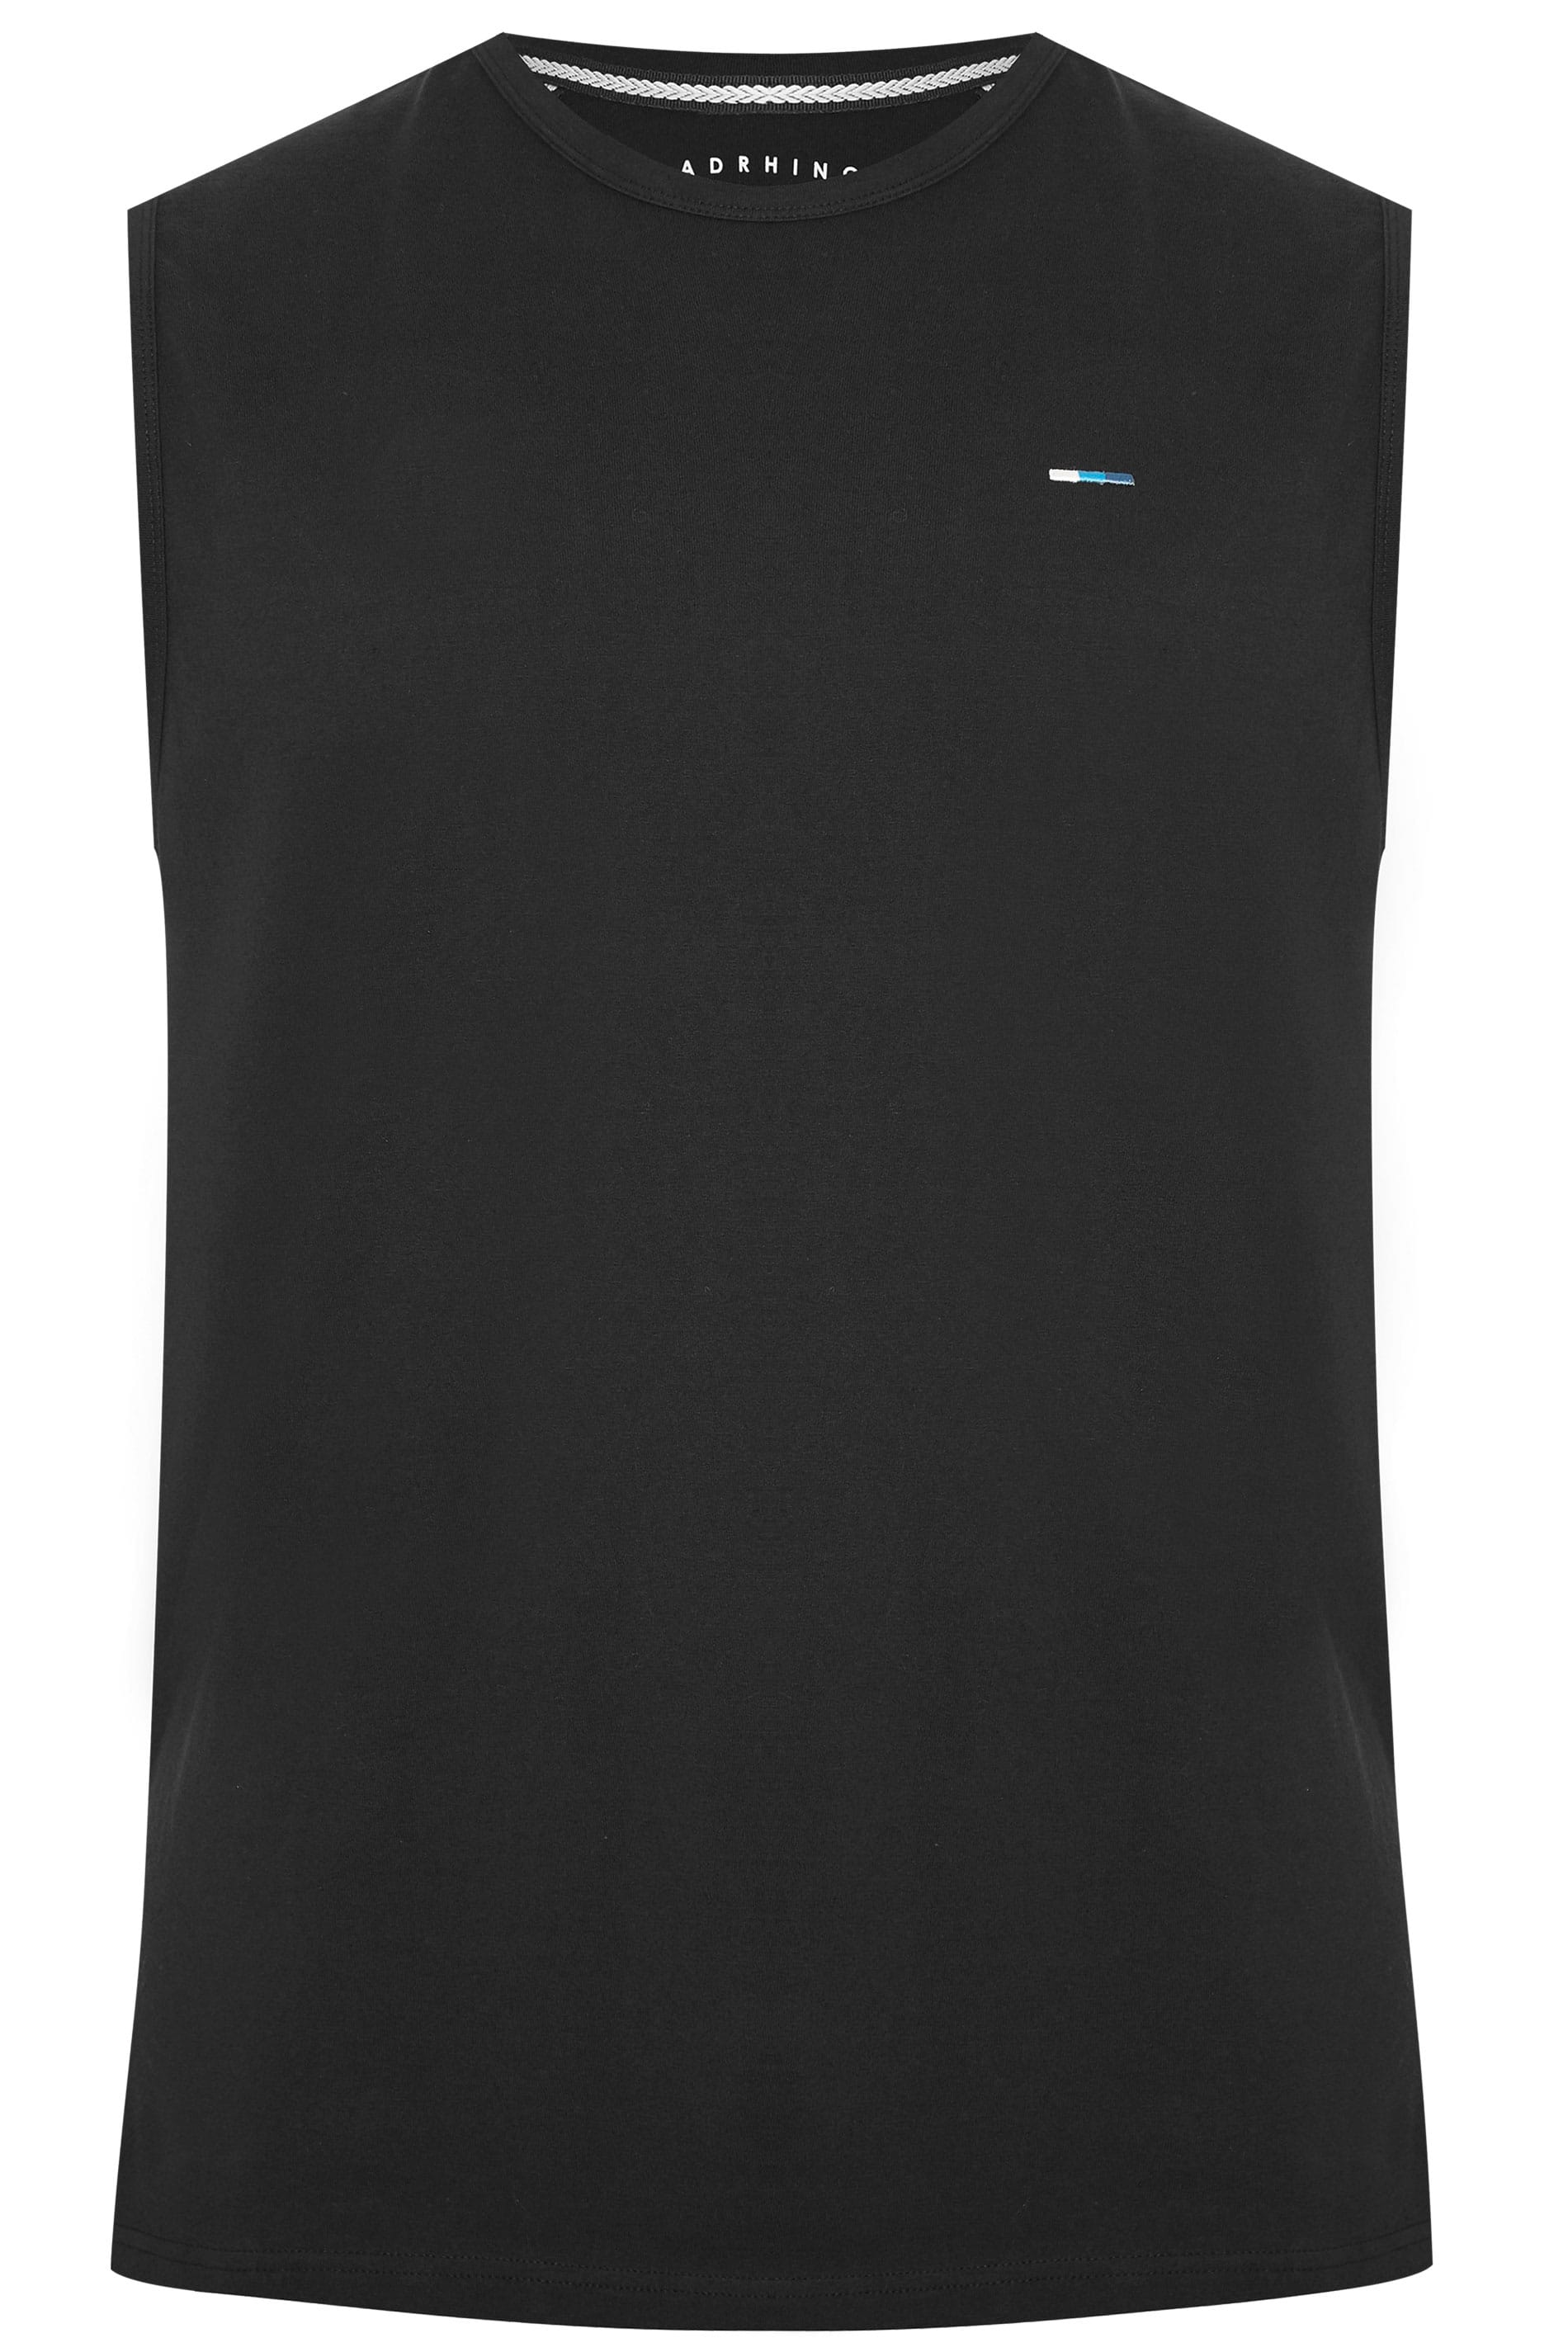 BadRhino Black Muscle Vest